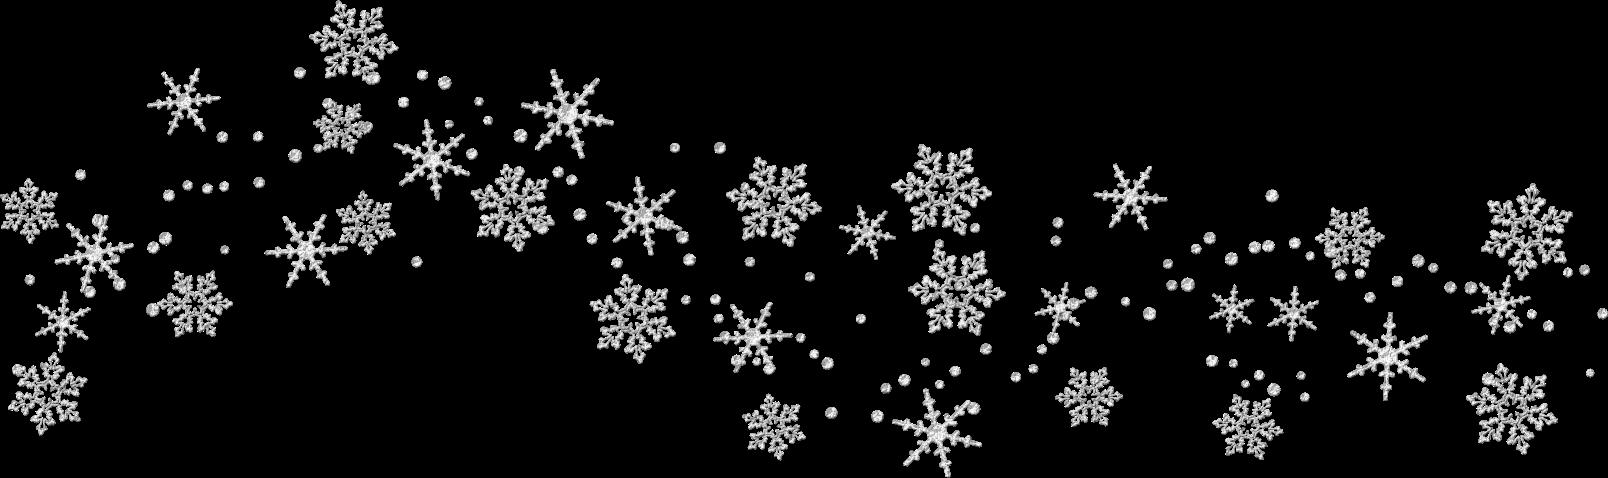 Snowflake Transparent Clipart.